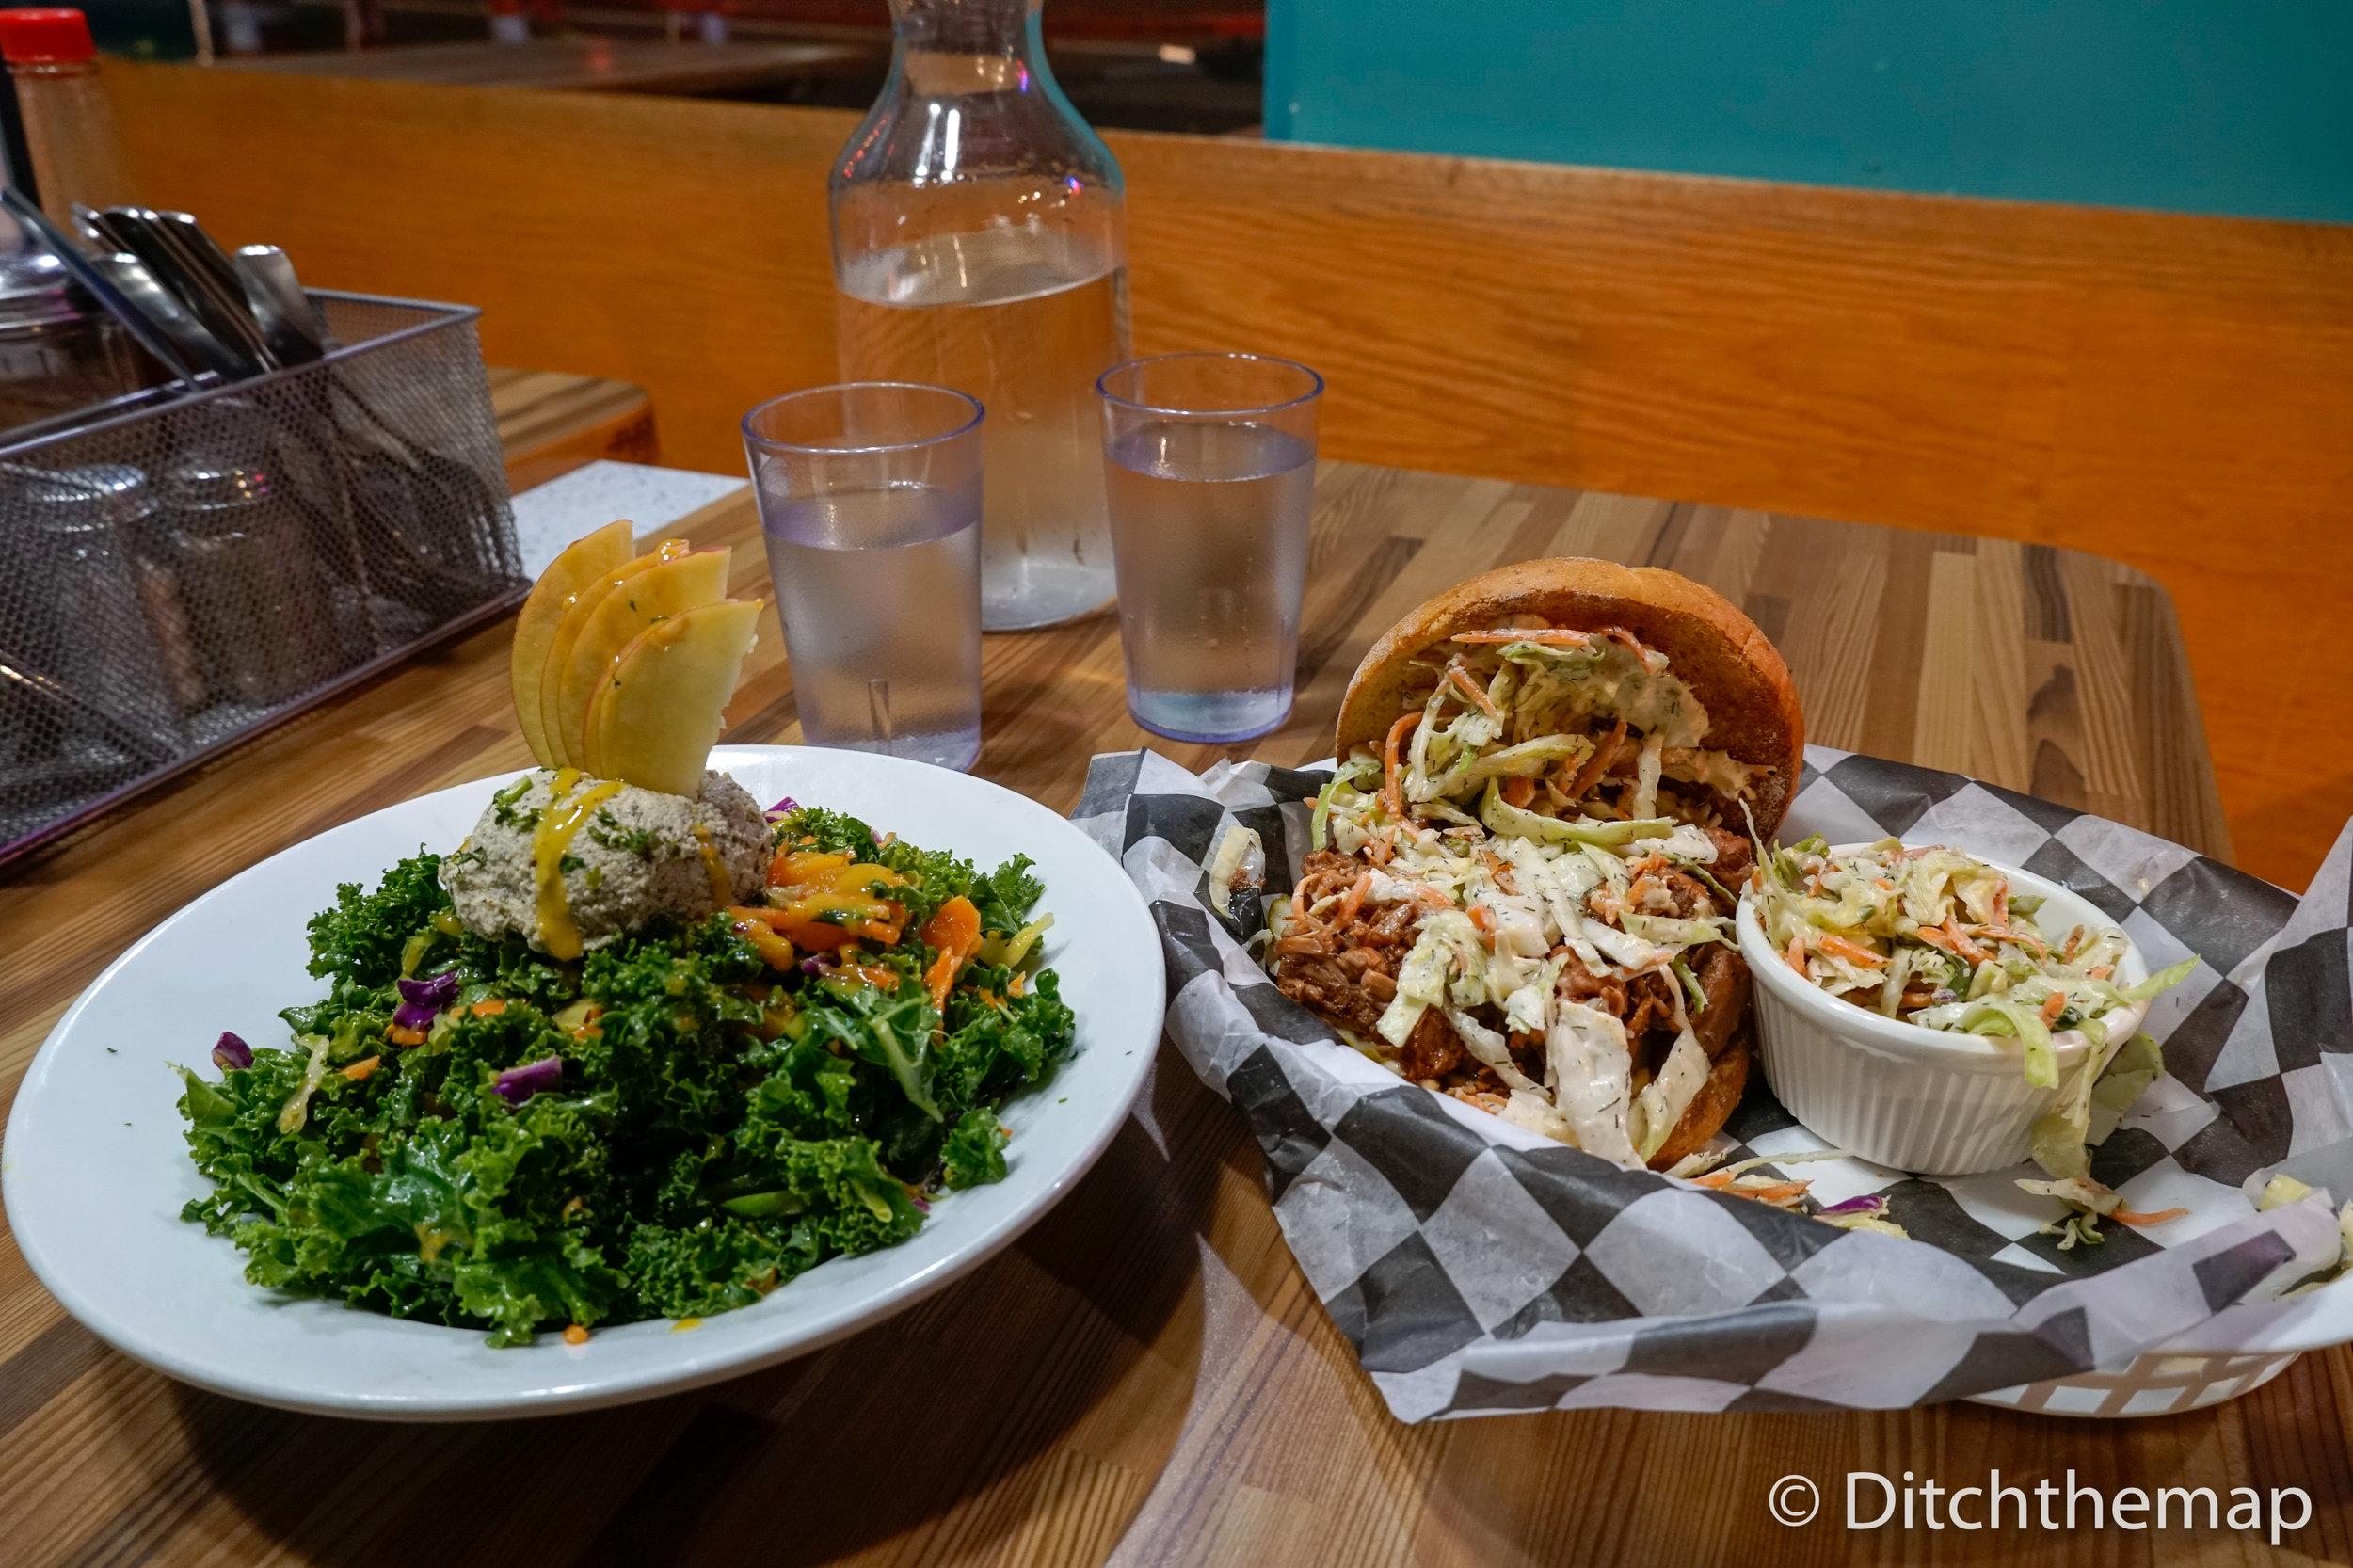 BBQ Jackfruit Sandwich & Goddess Bowl (Kale Salad)